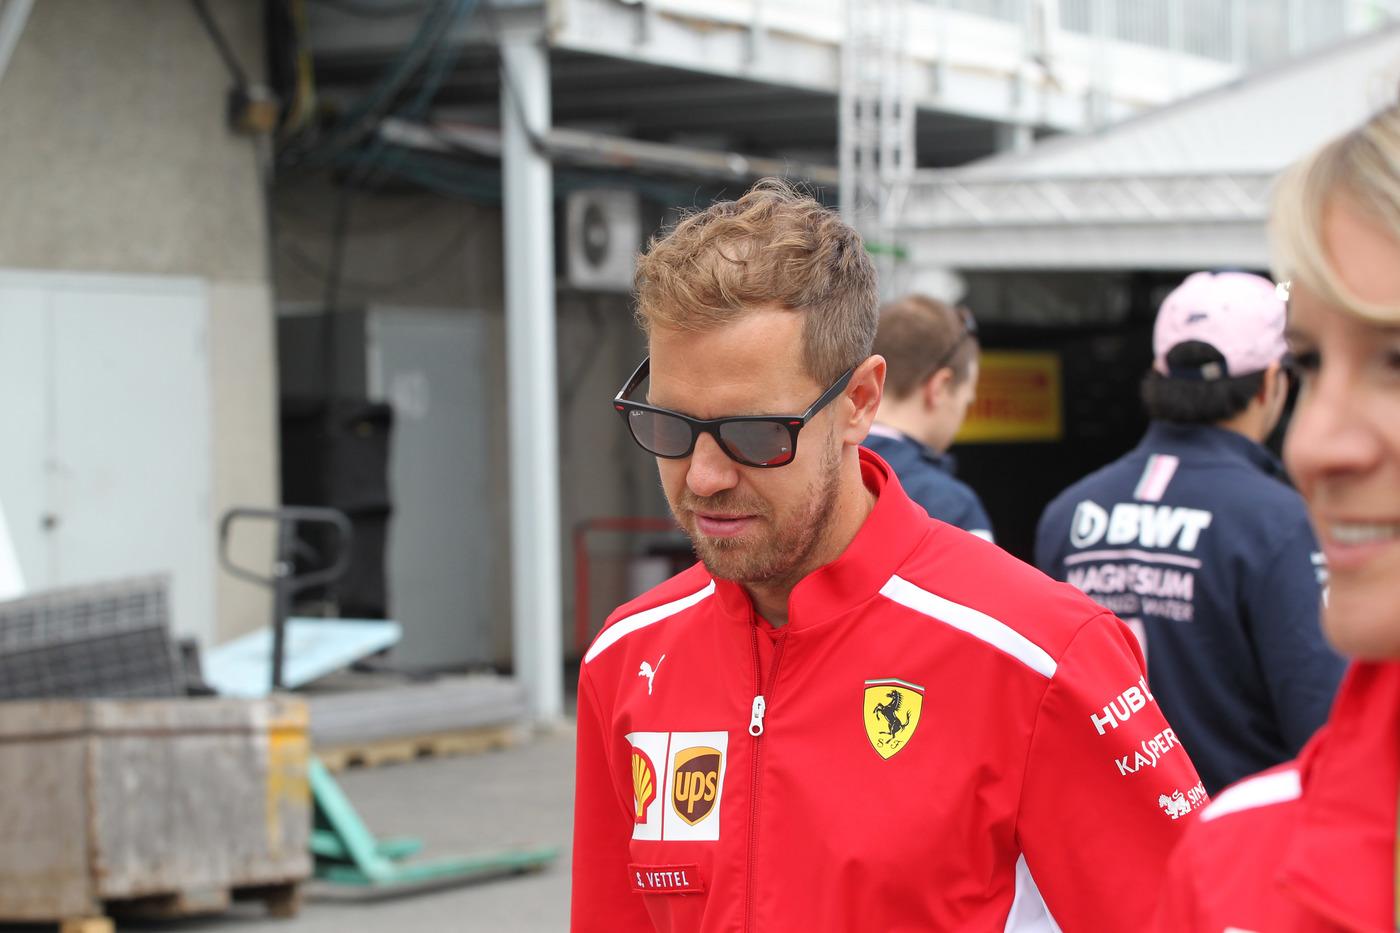 Vettel trionfa in Canada e torna in vetta al mondiale